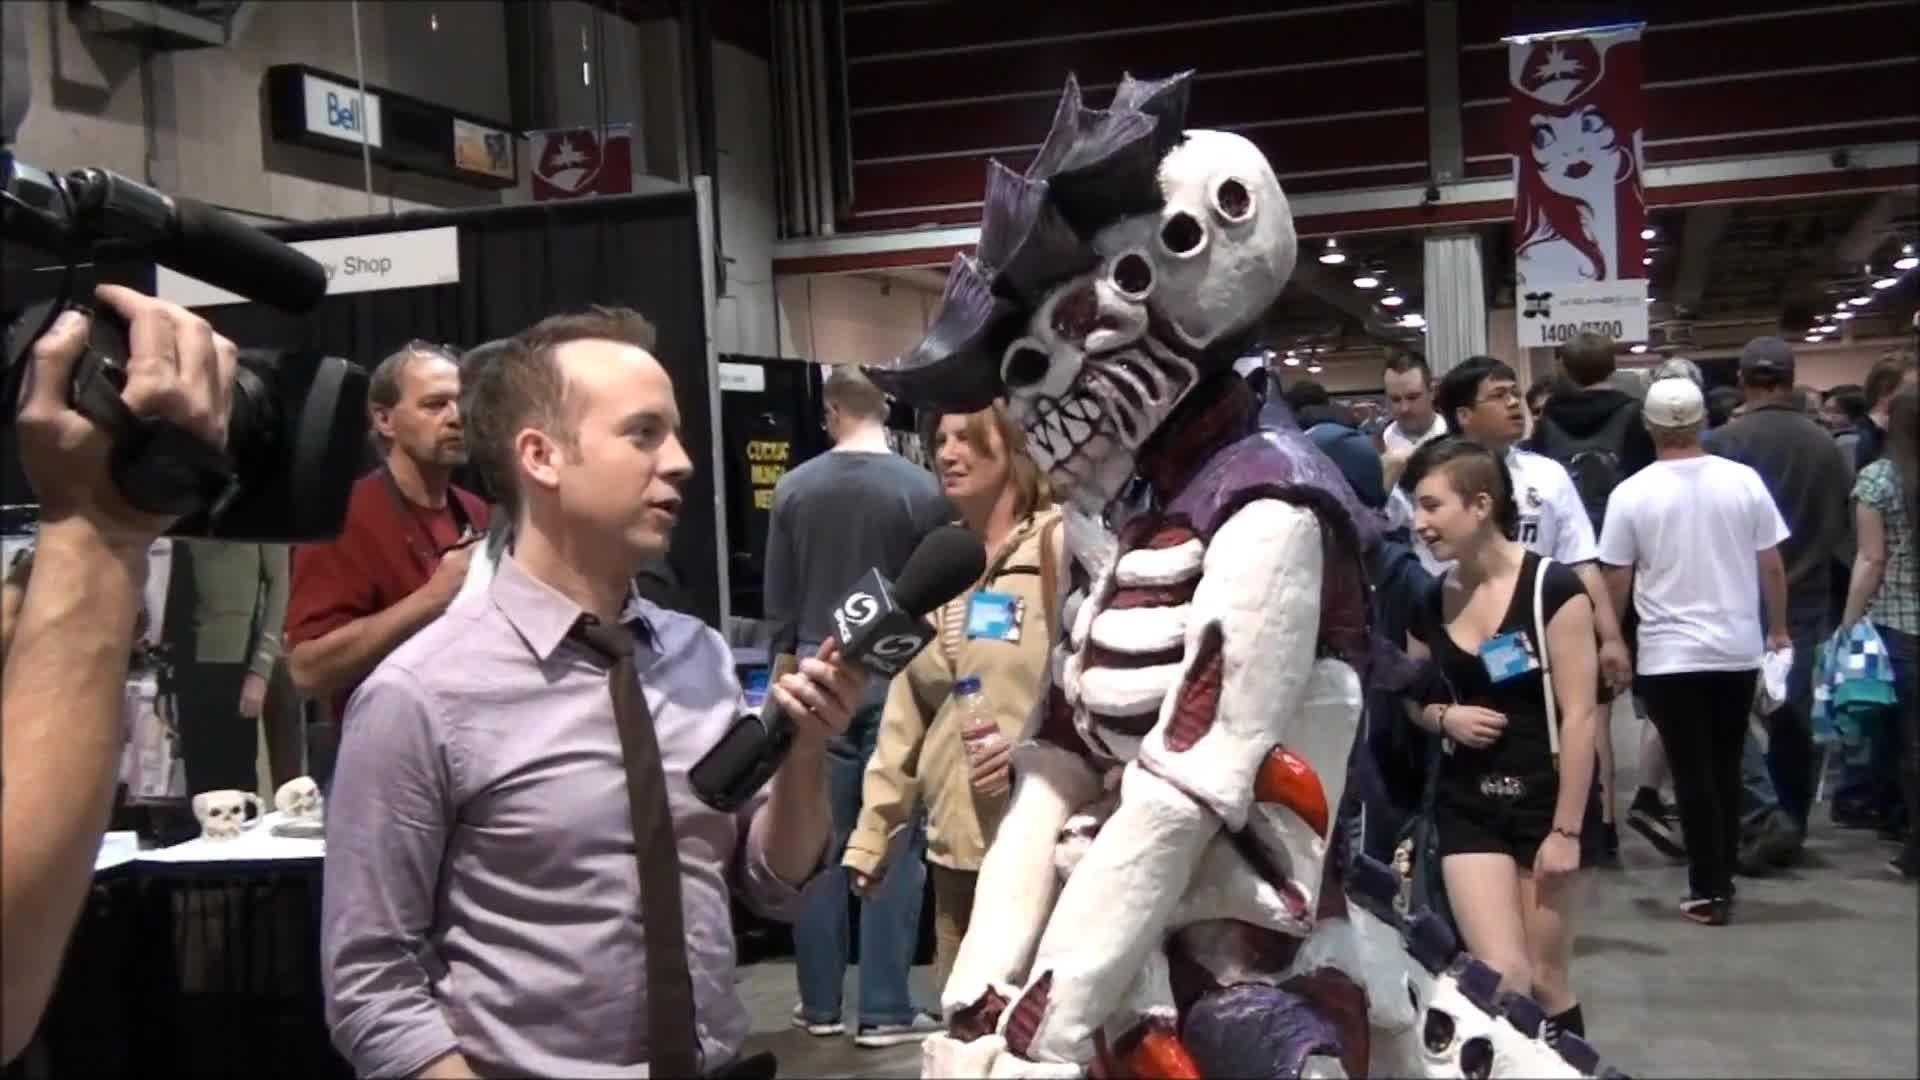 Tyranid Costume video – Warhammer 40k Tyranids Group – Mod DB